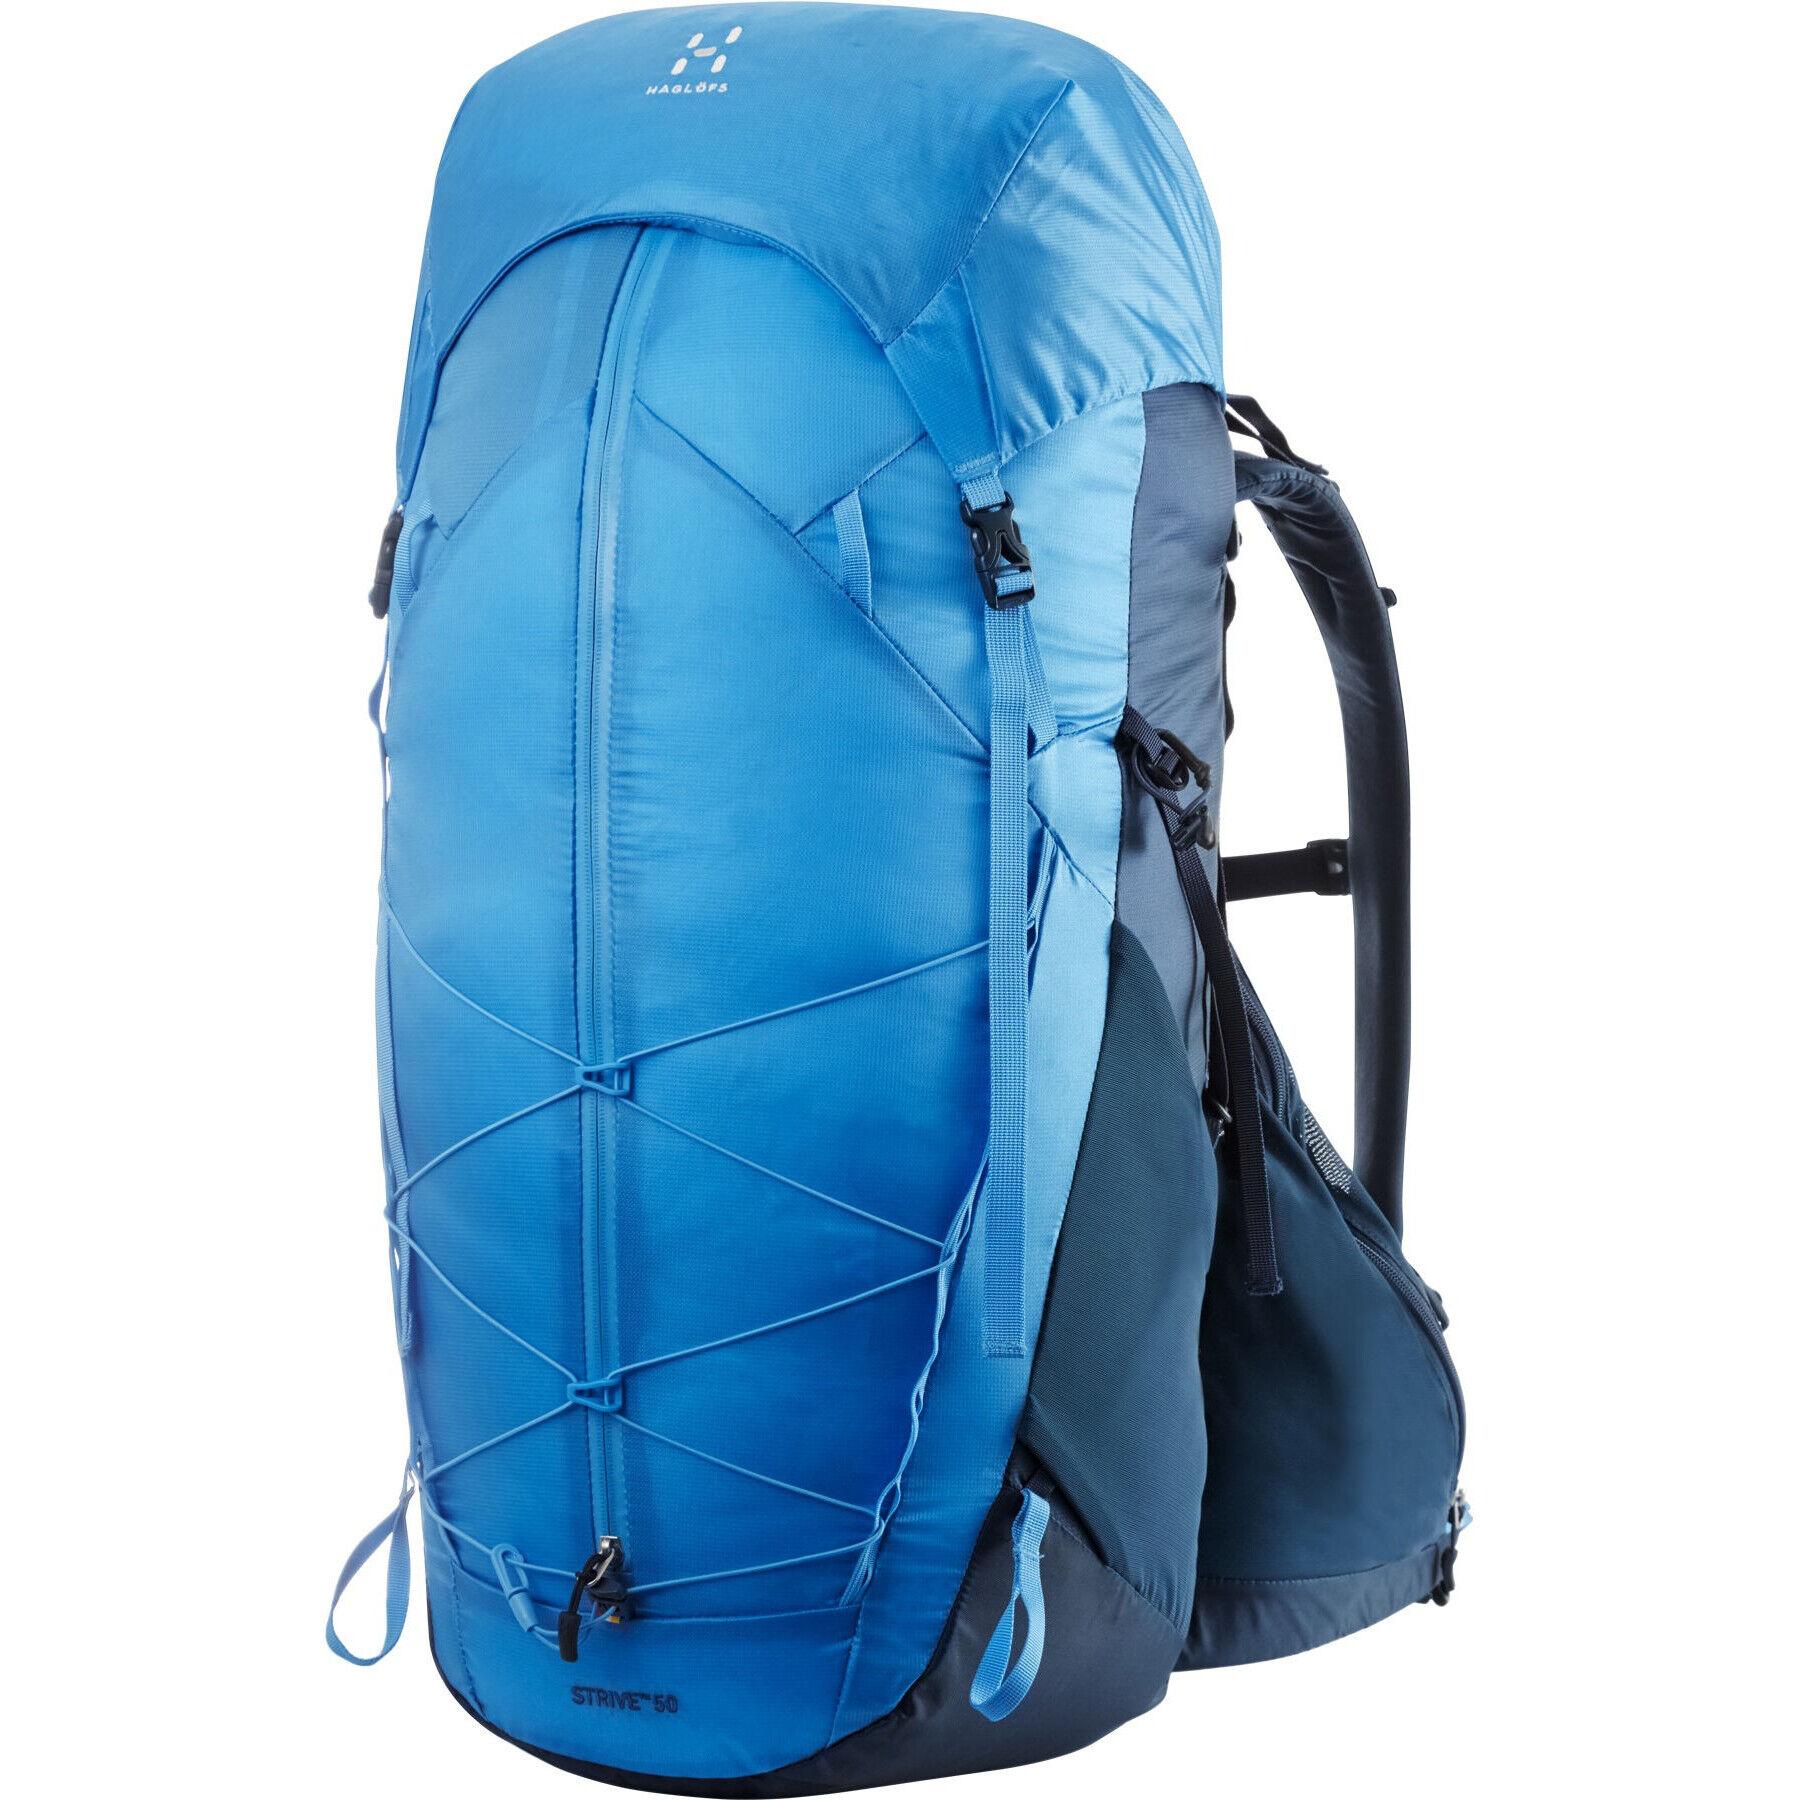 Haglöfs L.I.M Strive 50 Backpack blue inkblue agate